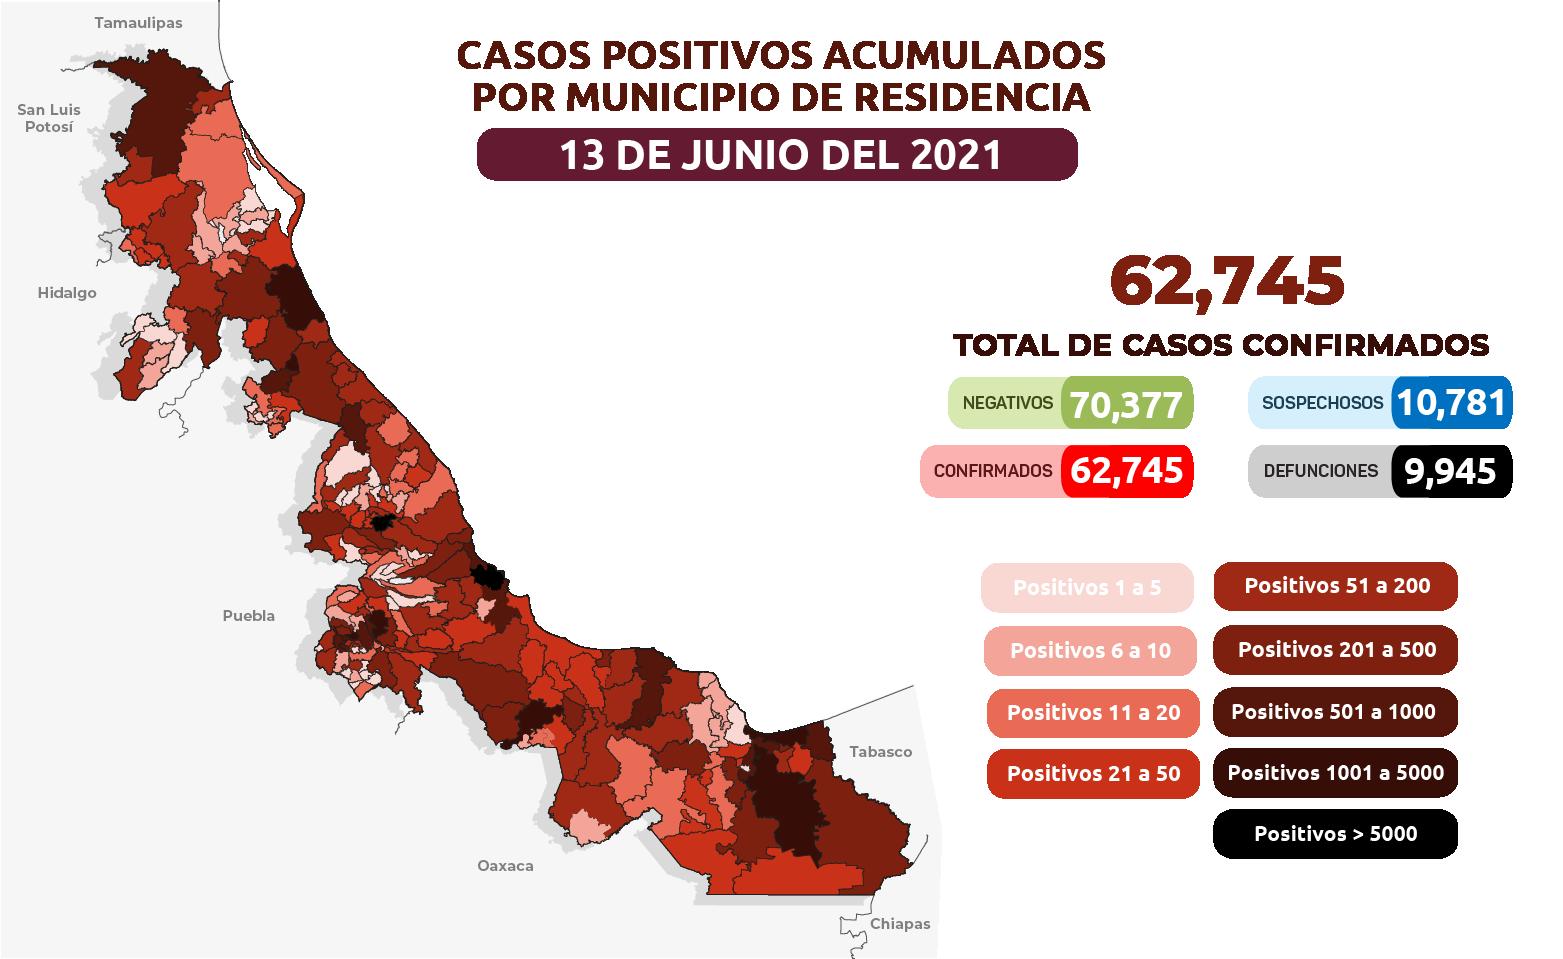 Casos positivos acumulados por municipio de residencia